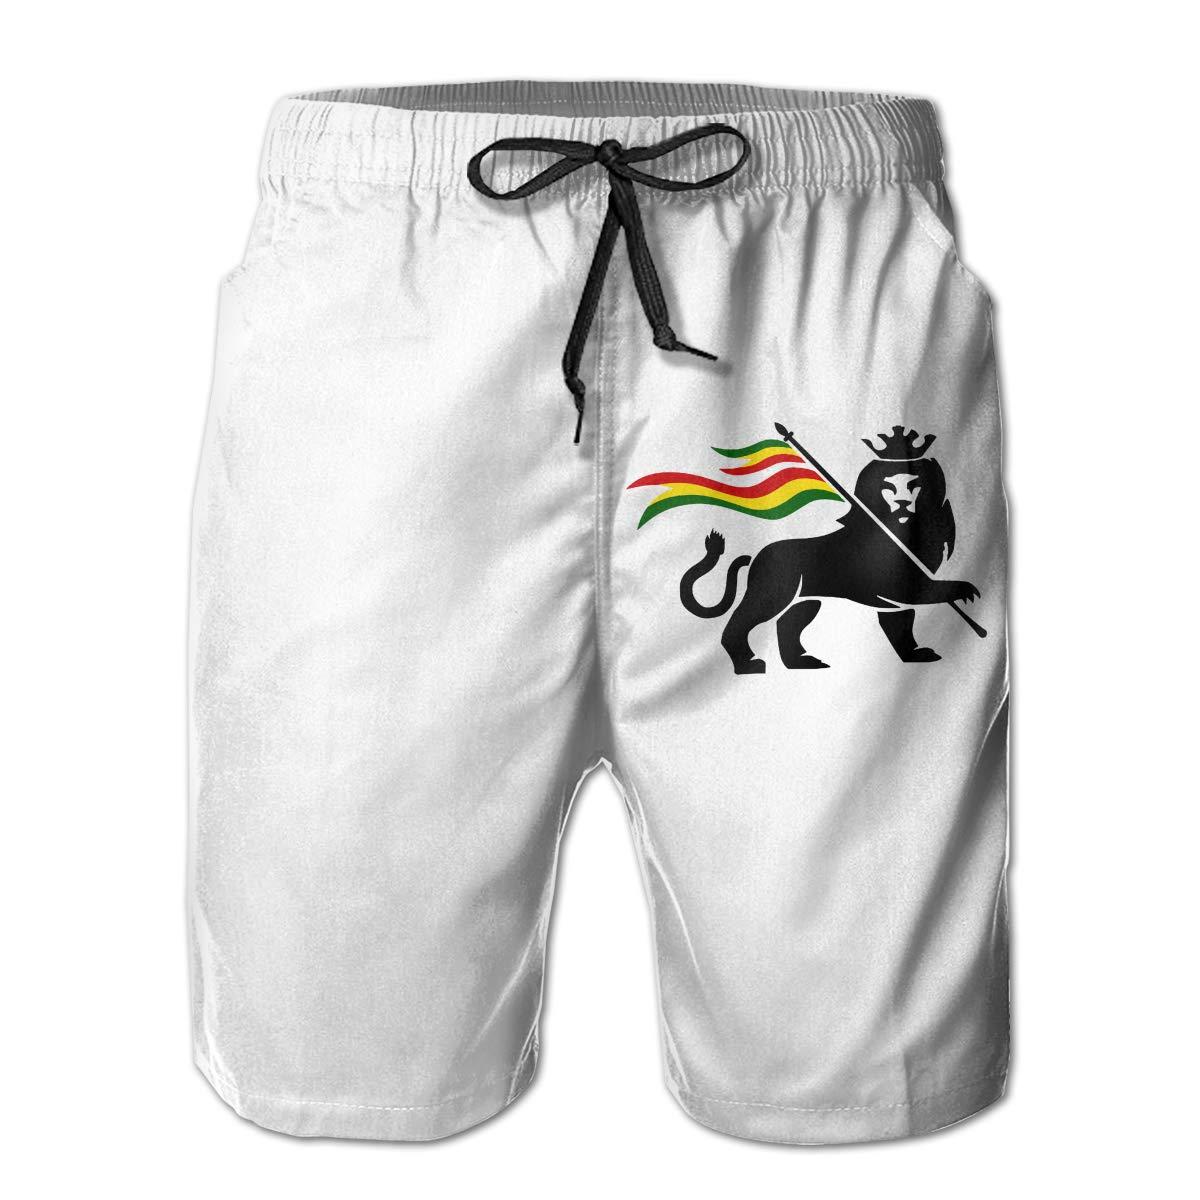 CCNXFGOK Rastafari Lion of Judah Boardshorts Mens Swimtrunks Fashion Beach Shorts Casual Shorts Swim Trunks